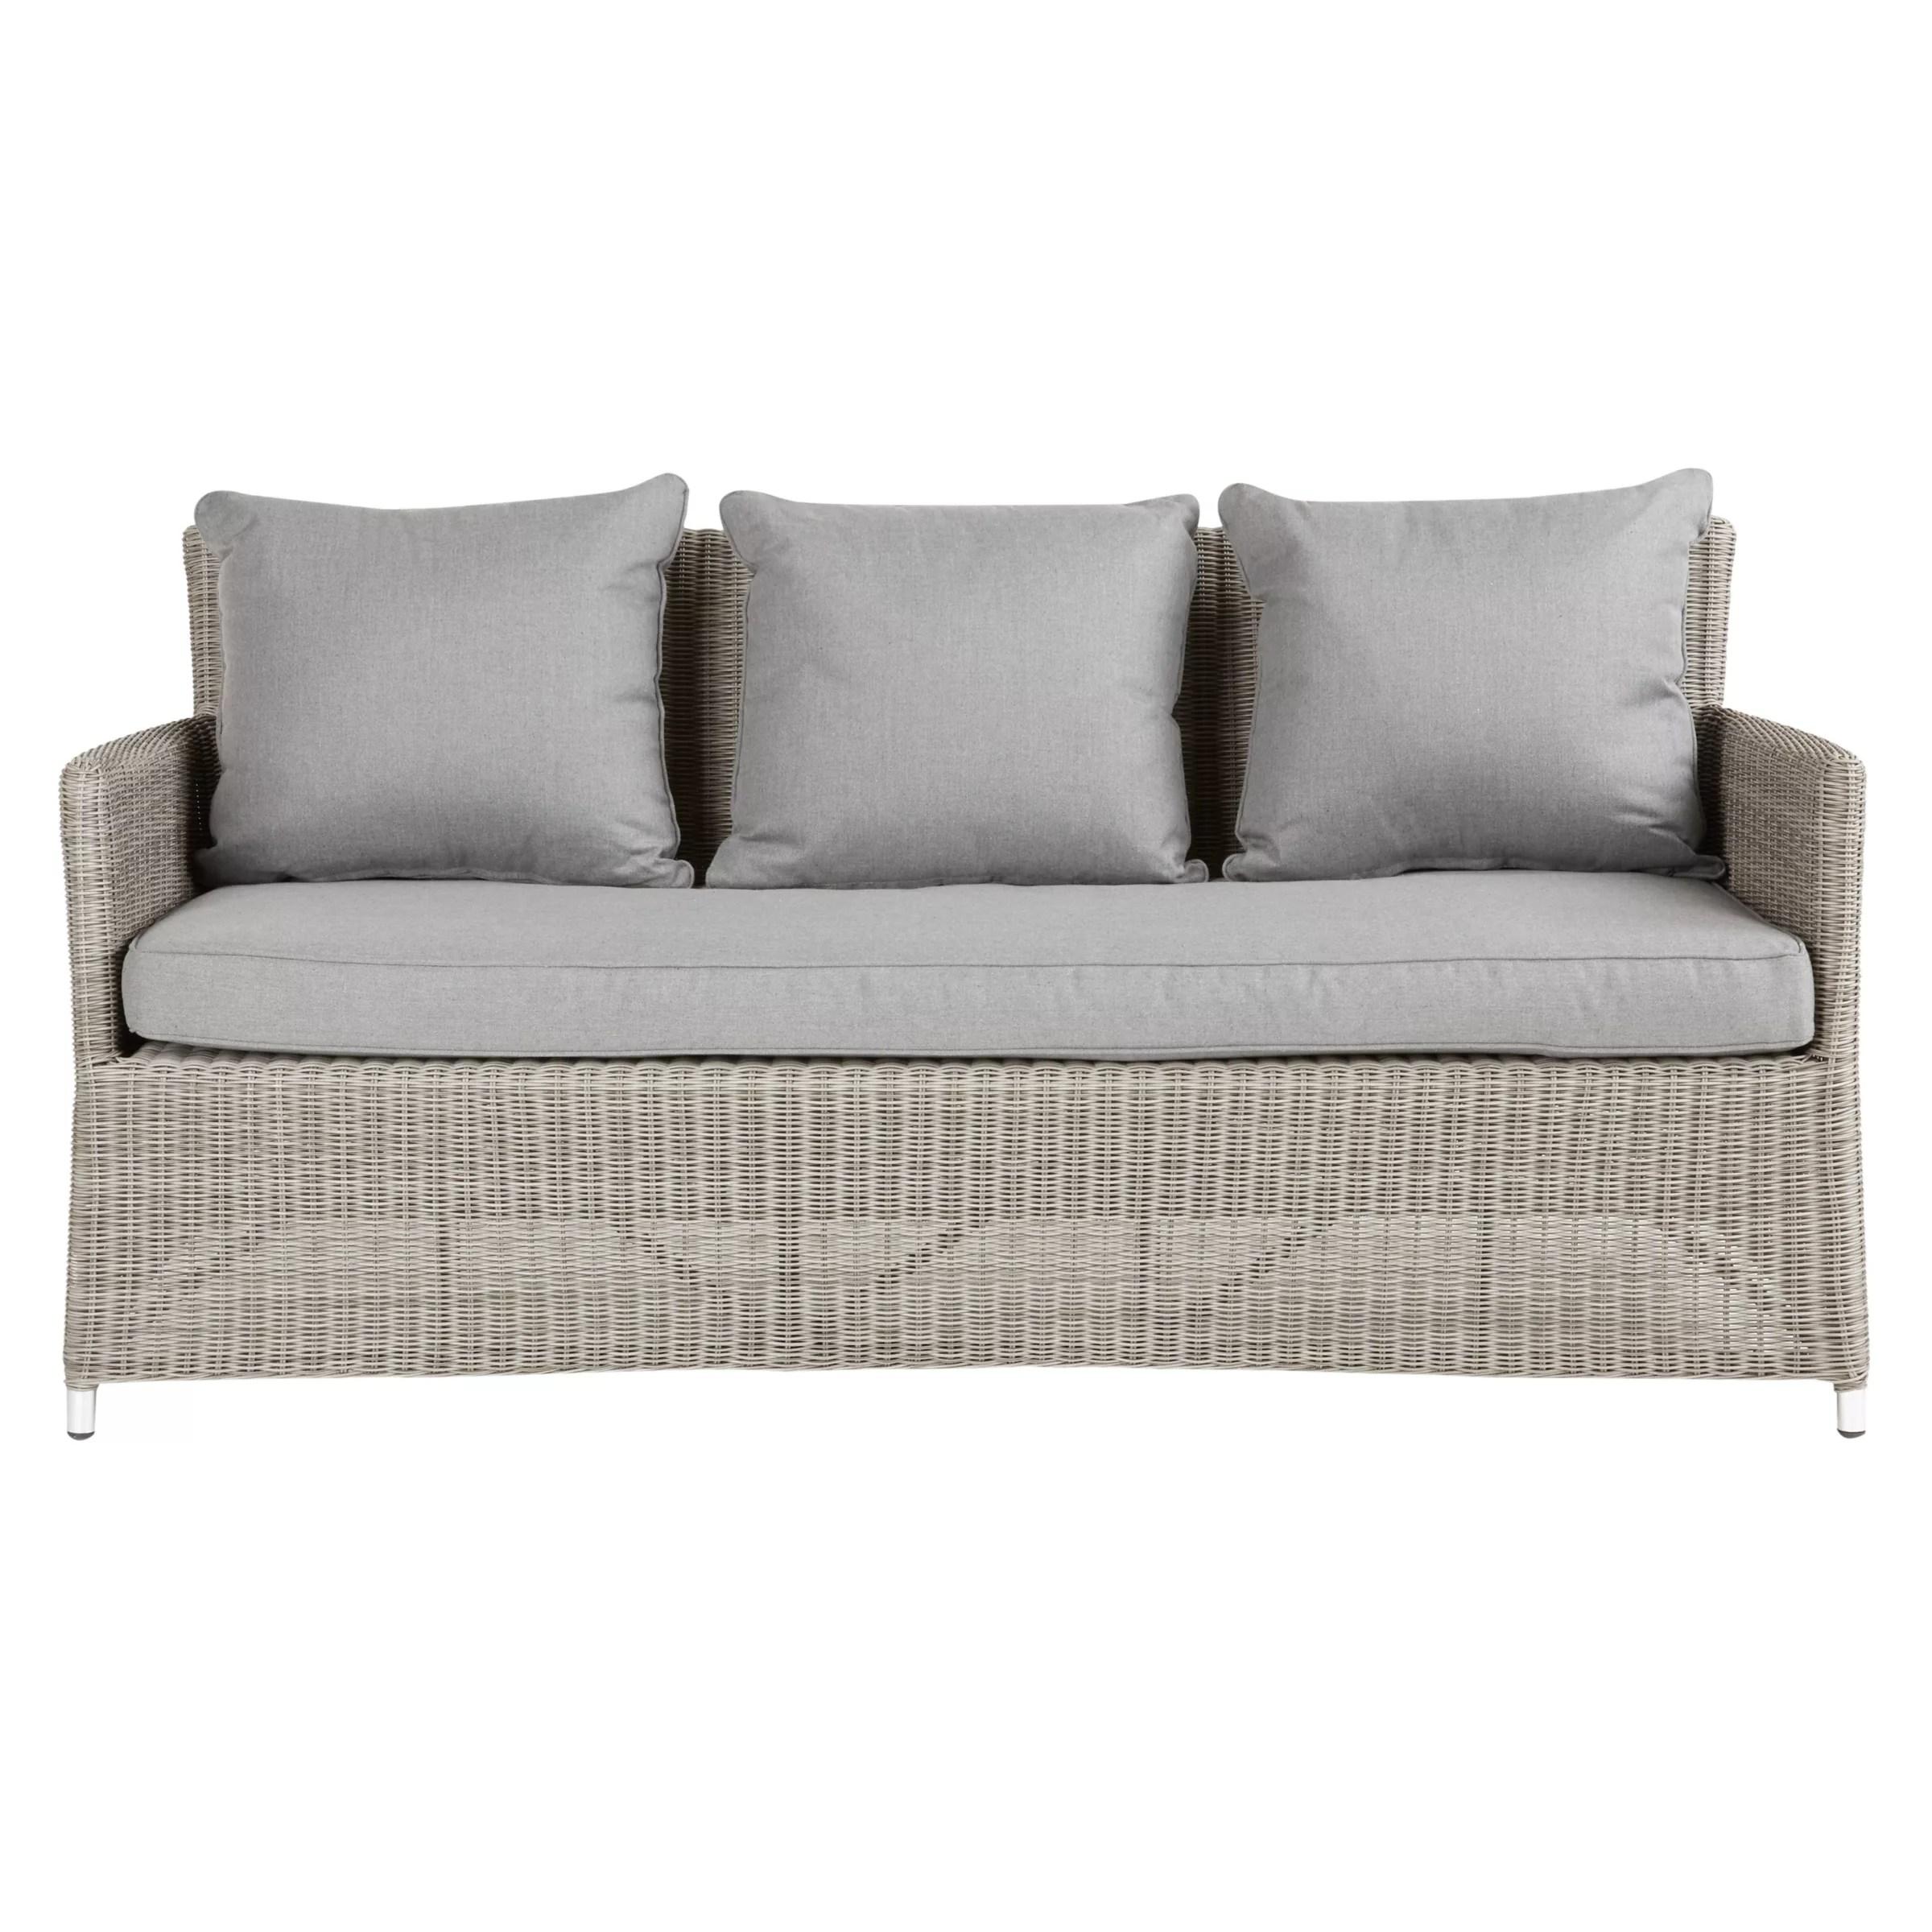 sofas within 10000 klaussner living room posen sofa 83844 john lewis dante 3 seater outdoor at